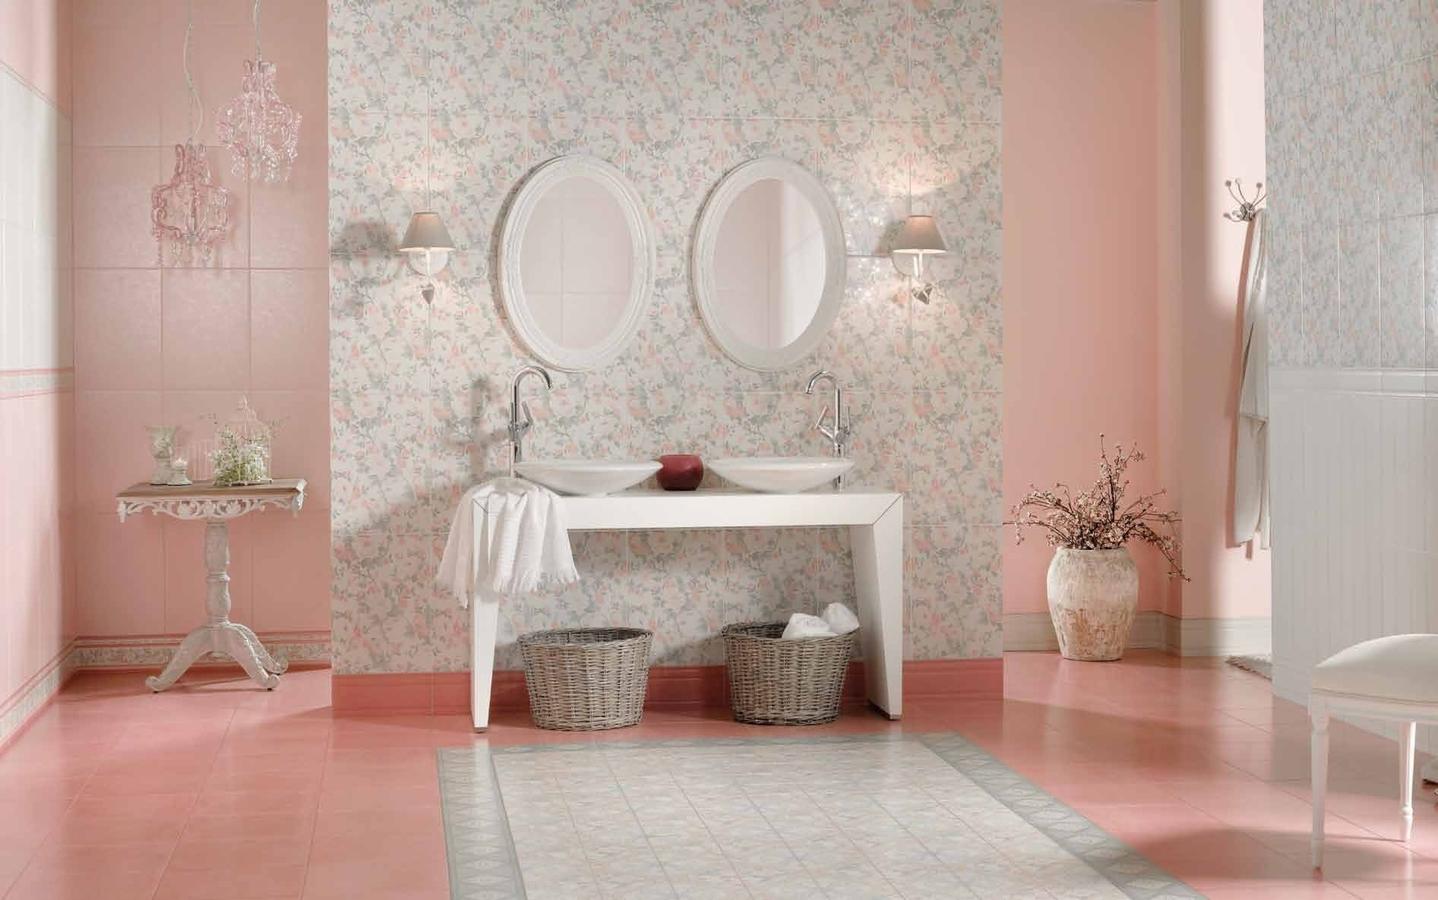 Provence di peronda. tile.expert u2013 rivenditore di piastrelle